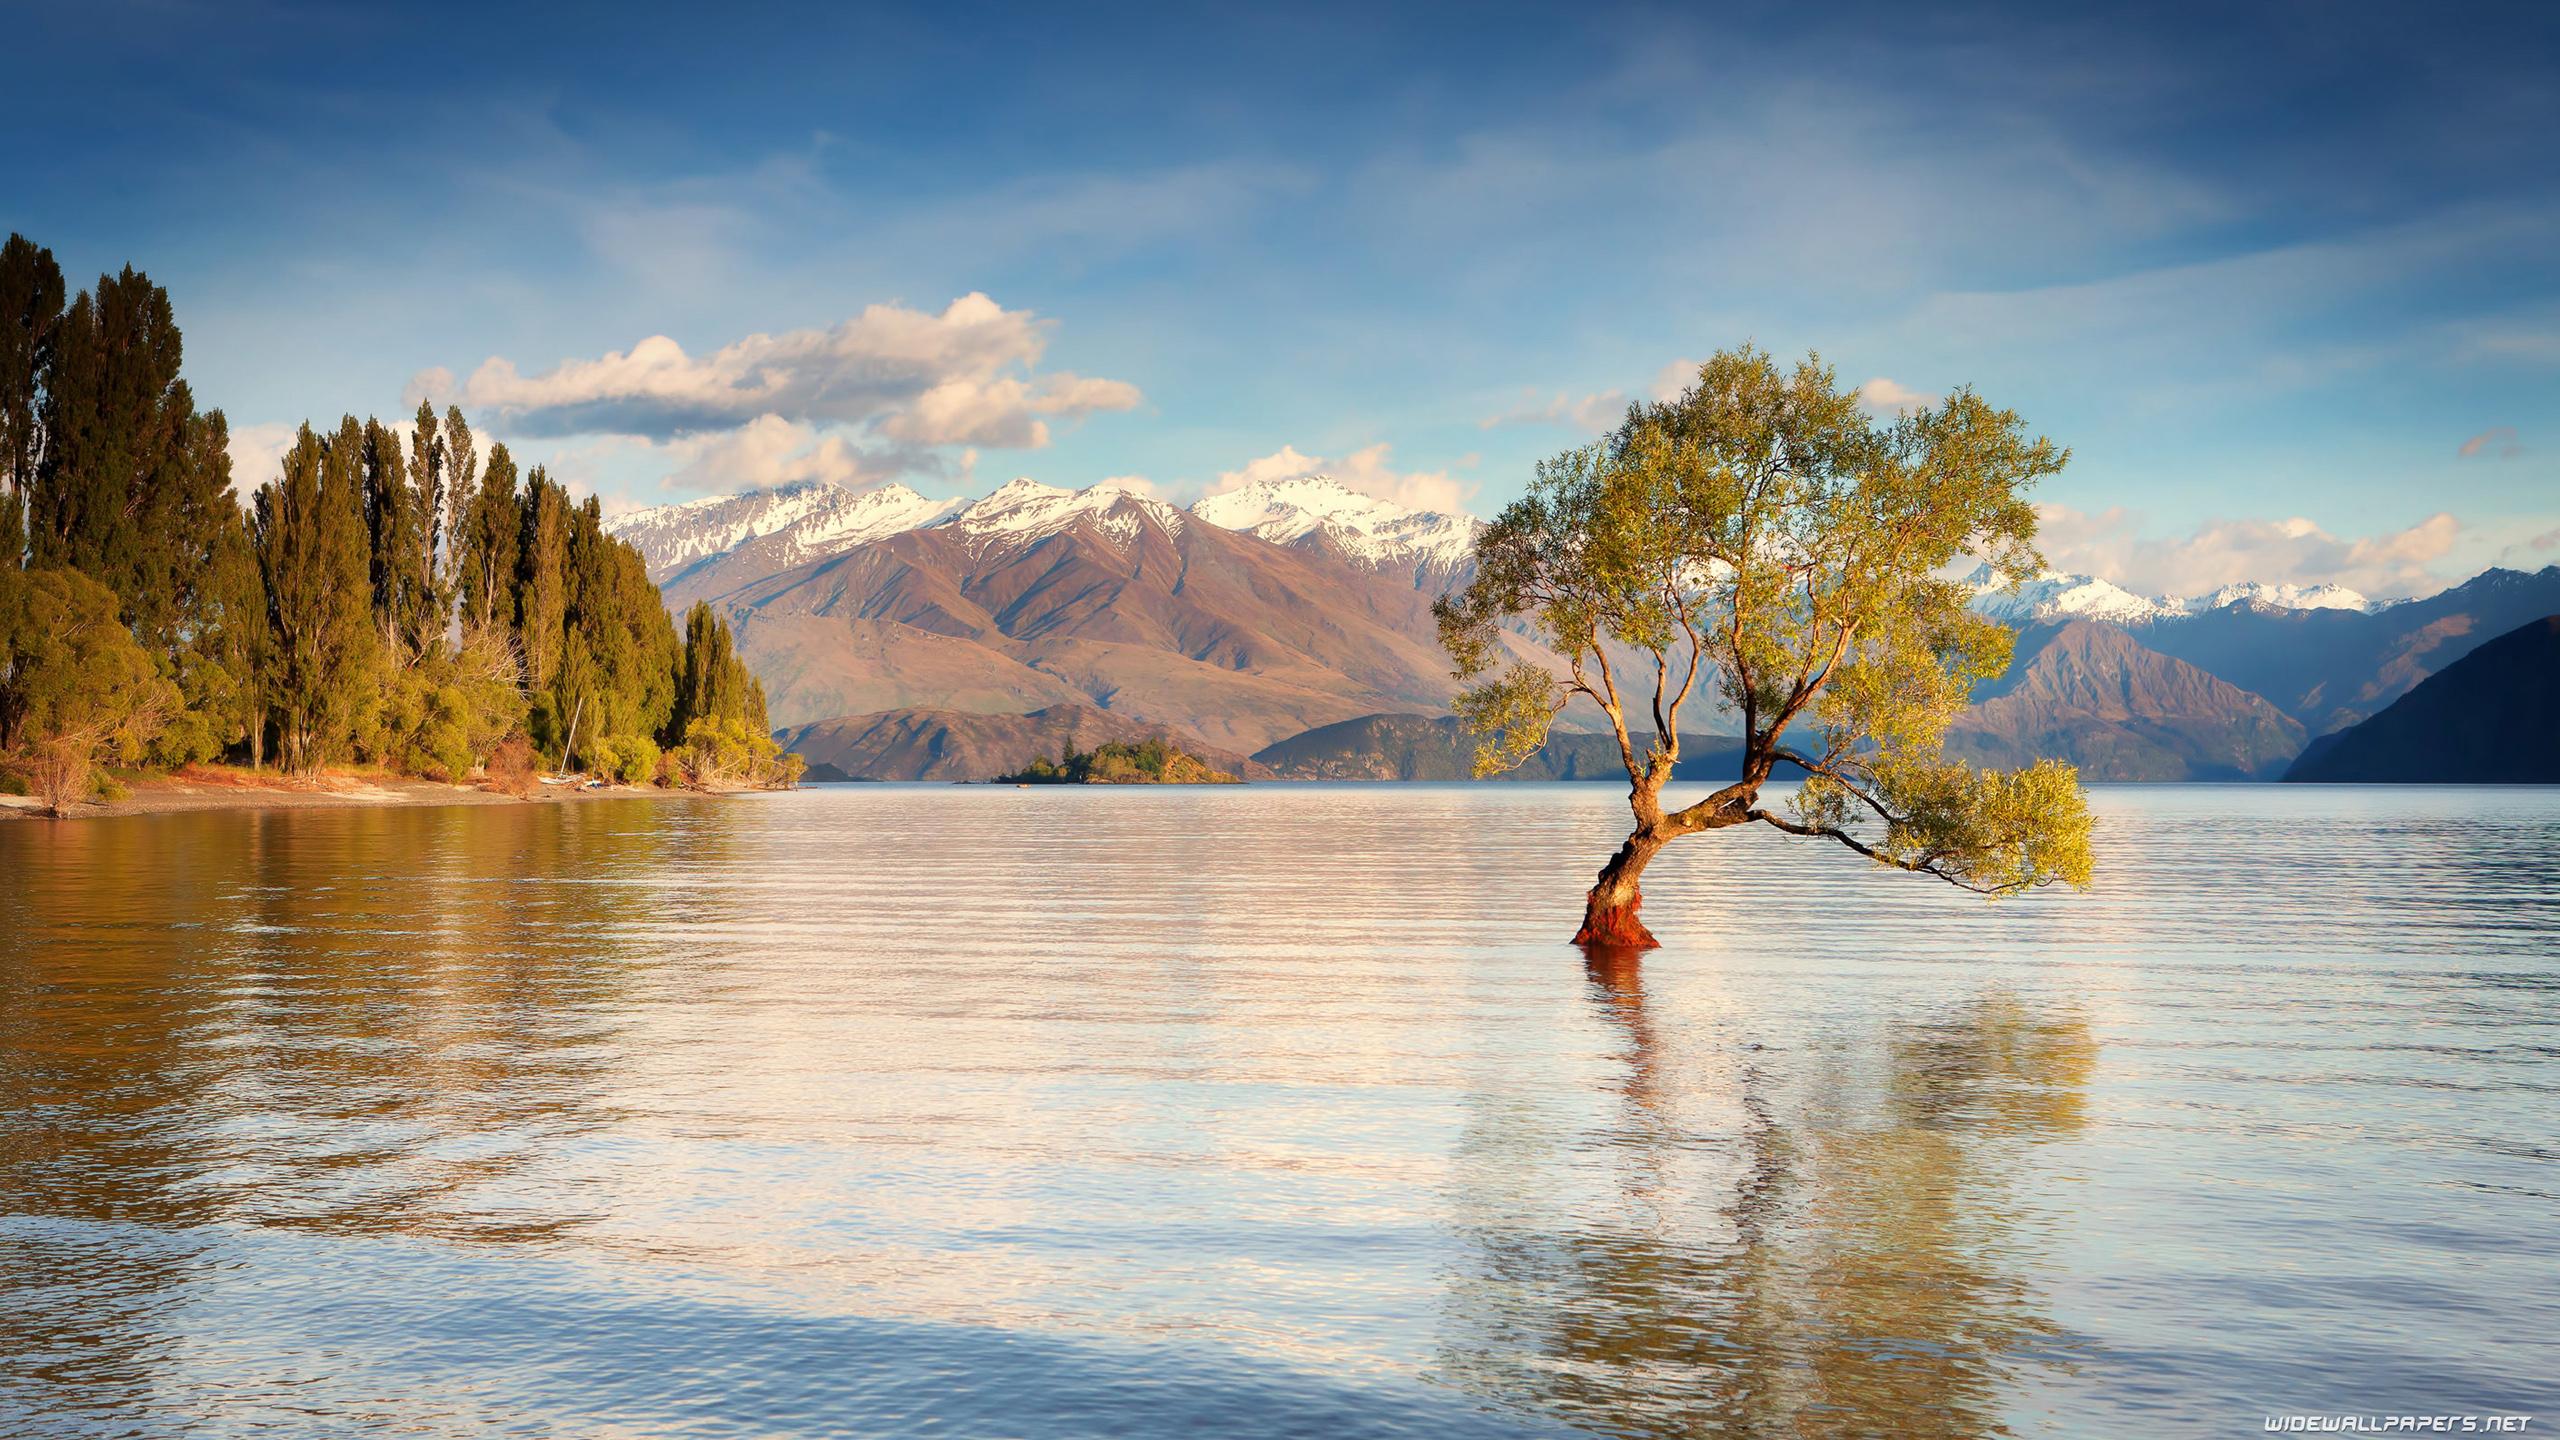 New Zealand Wallpapers 4k Ultra Hd New Zealand - New Zealand Wanaka Background , HD Wallpaper & Backgrounds